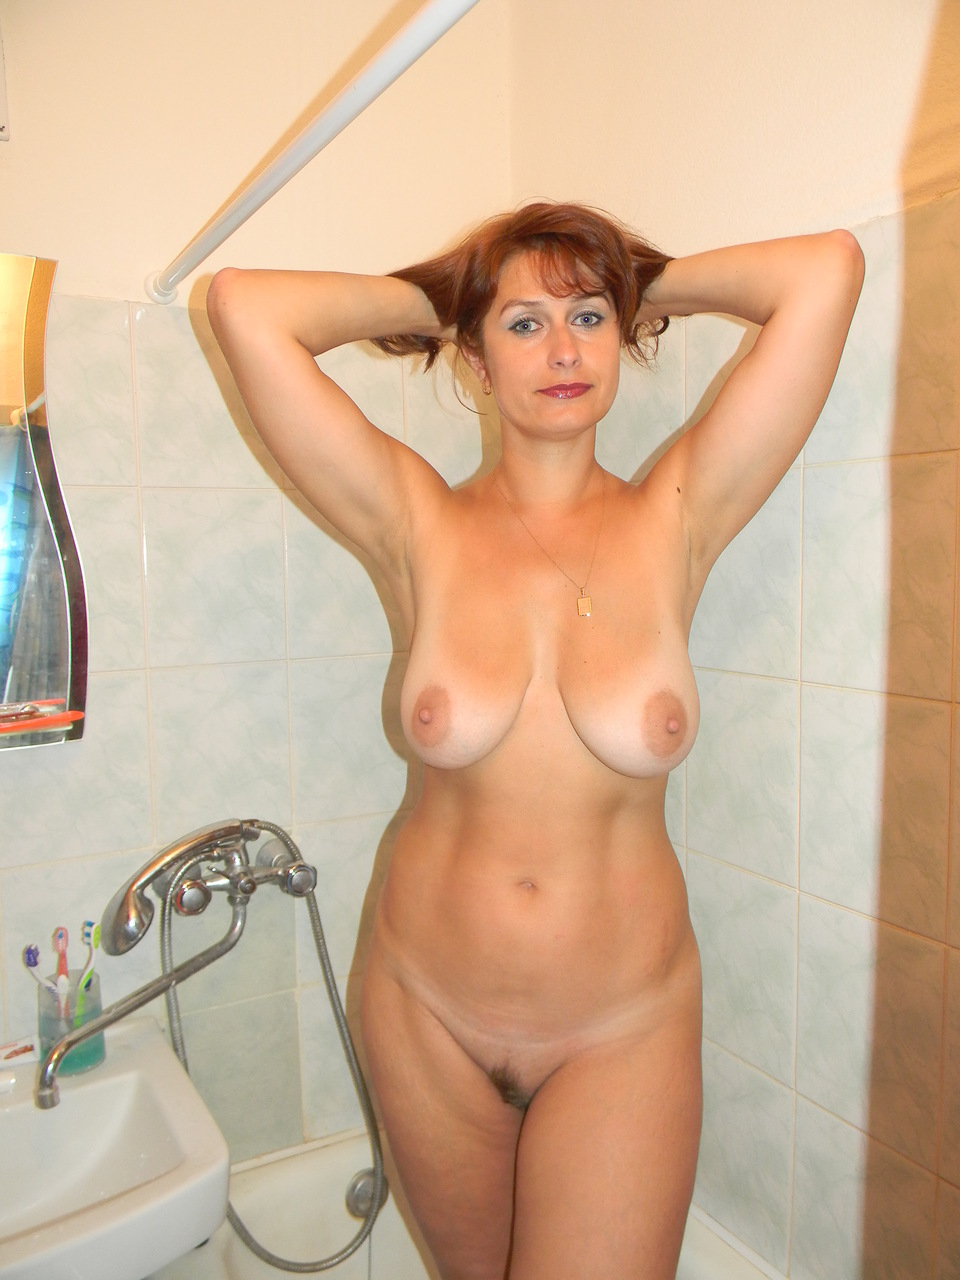 Галереи фотографий голых зрелых женщин — img 6